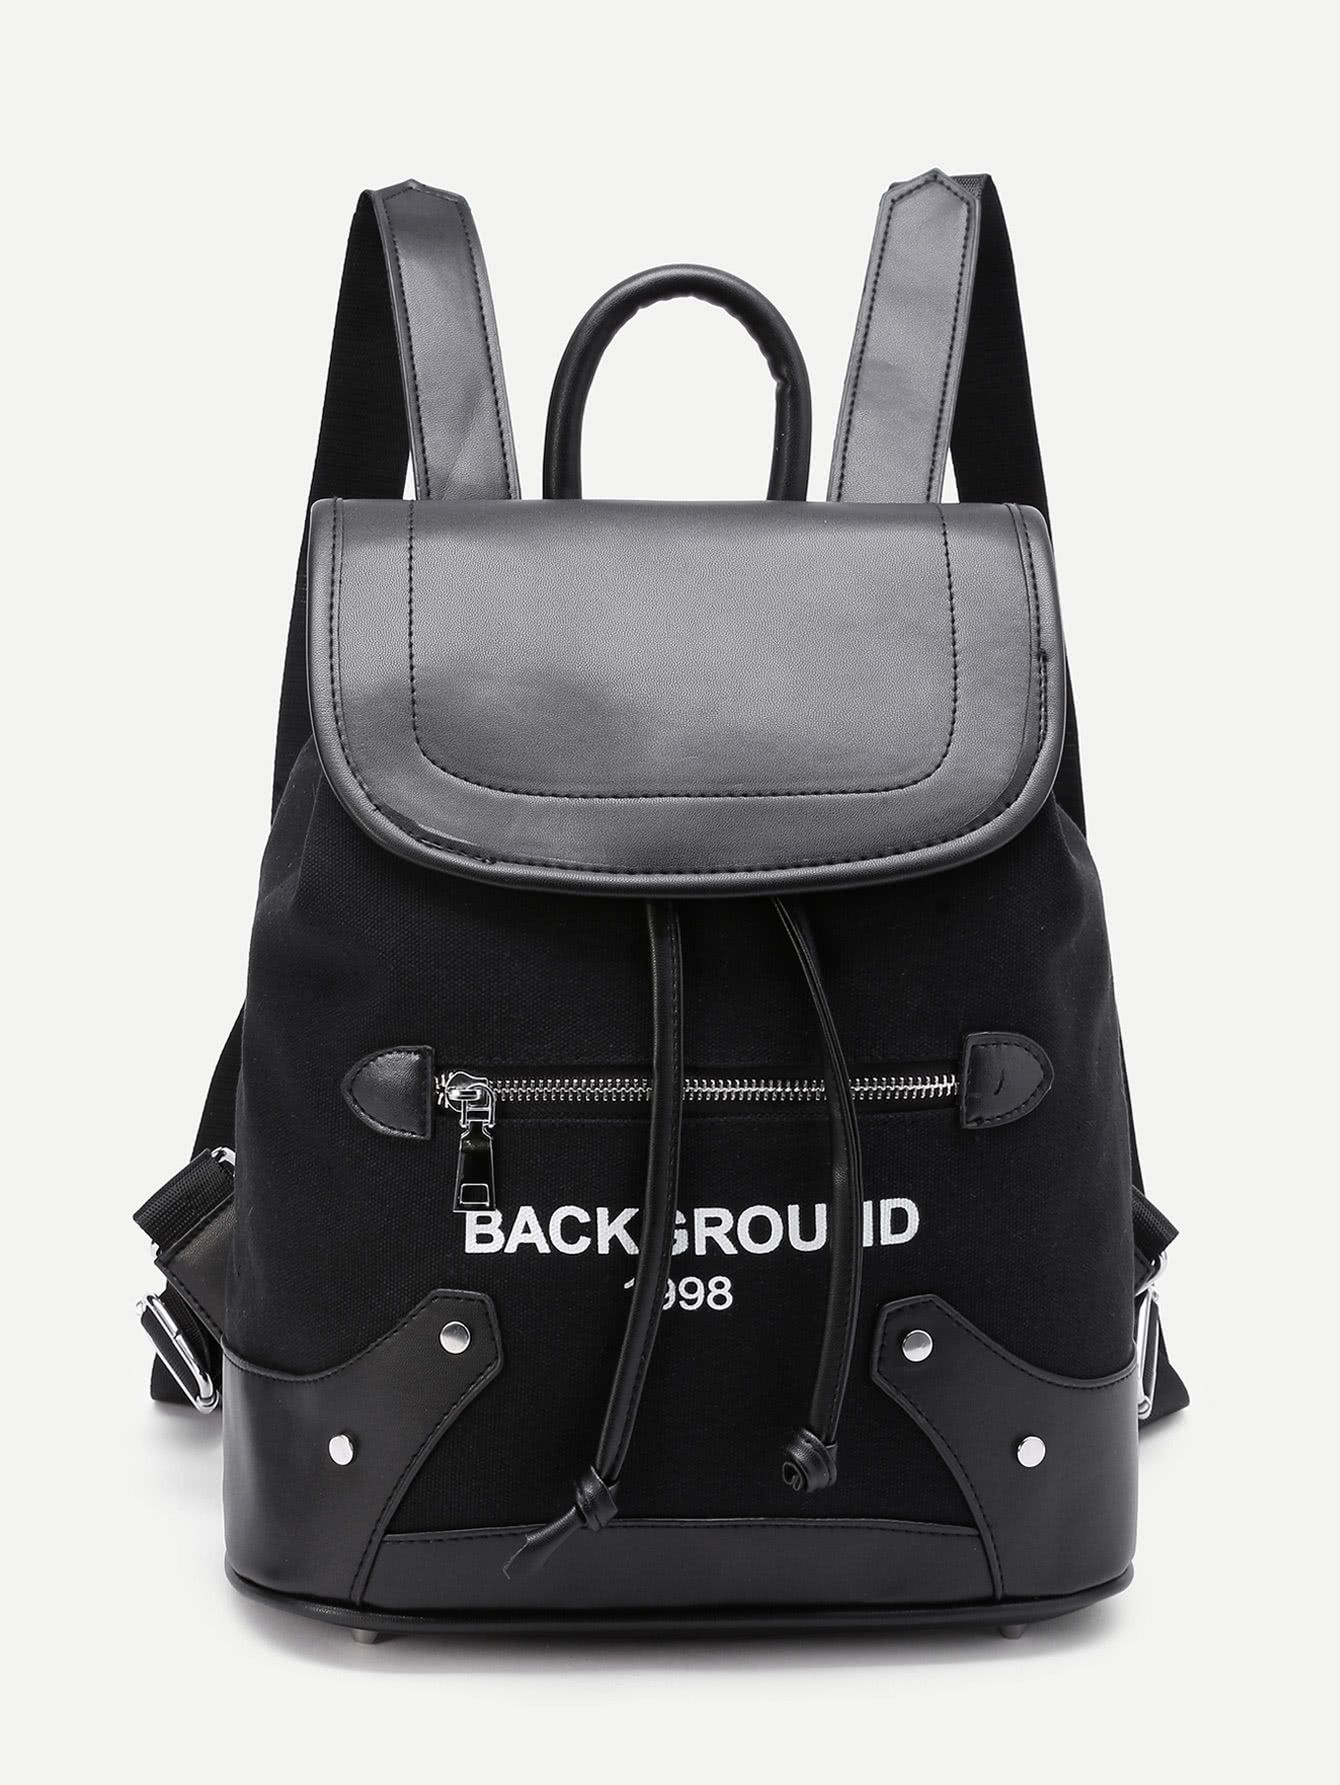 524b242e85445 Letter Print Drawstring Flap Backpack -SheIn(Sheinside) | Utility ...